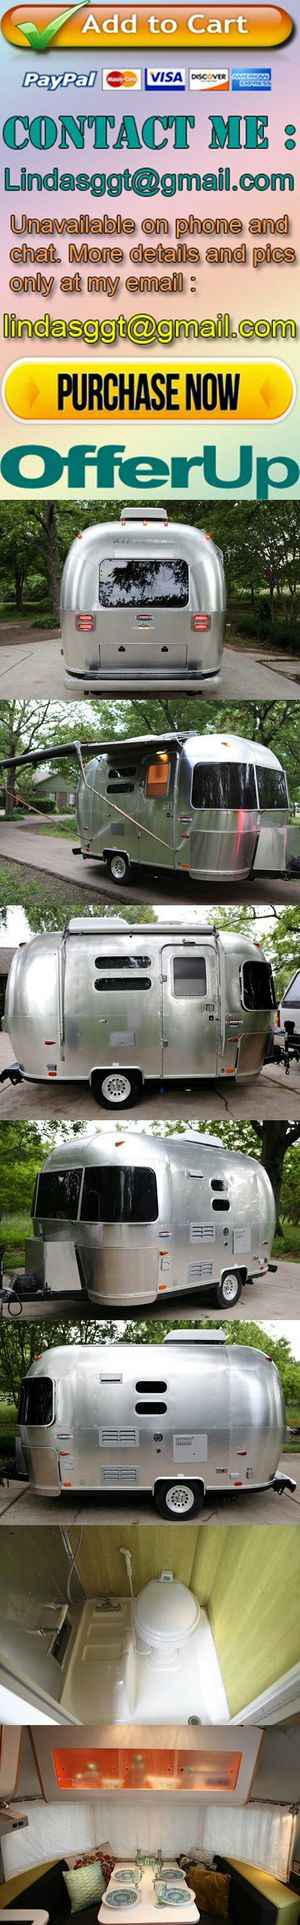 2005 Airstream Bambi Camper Rv Travel Trailer